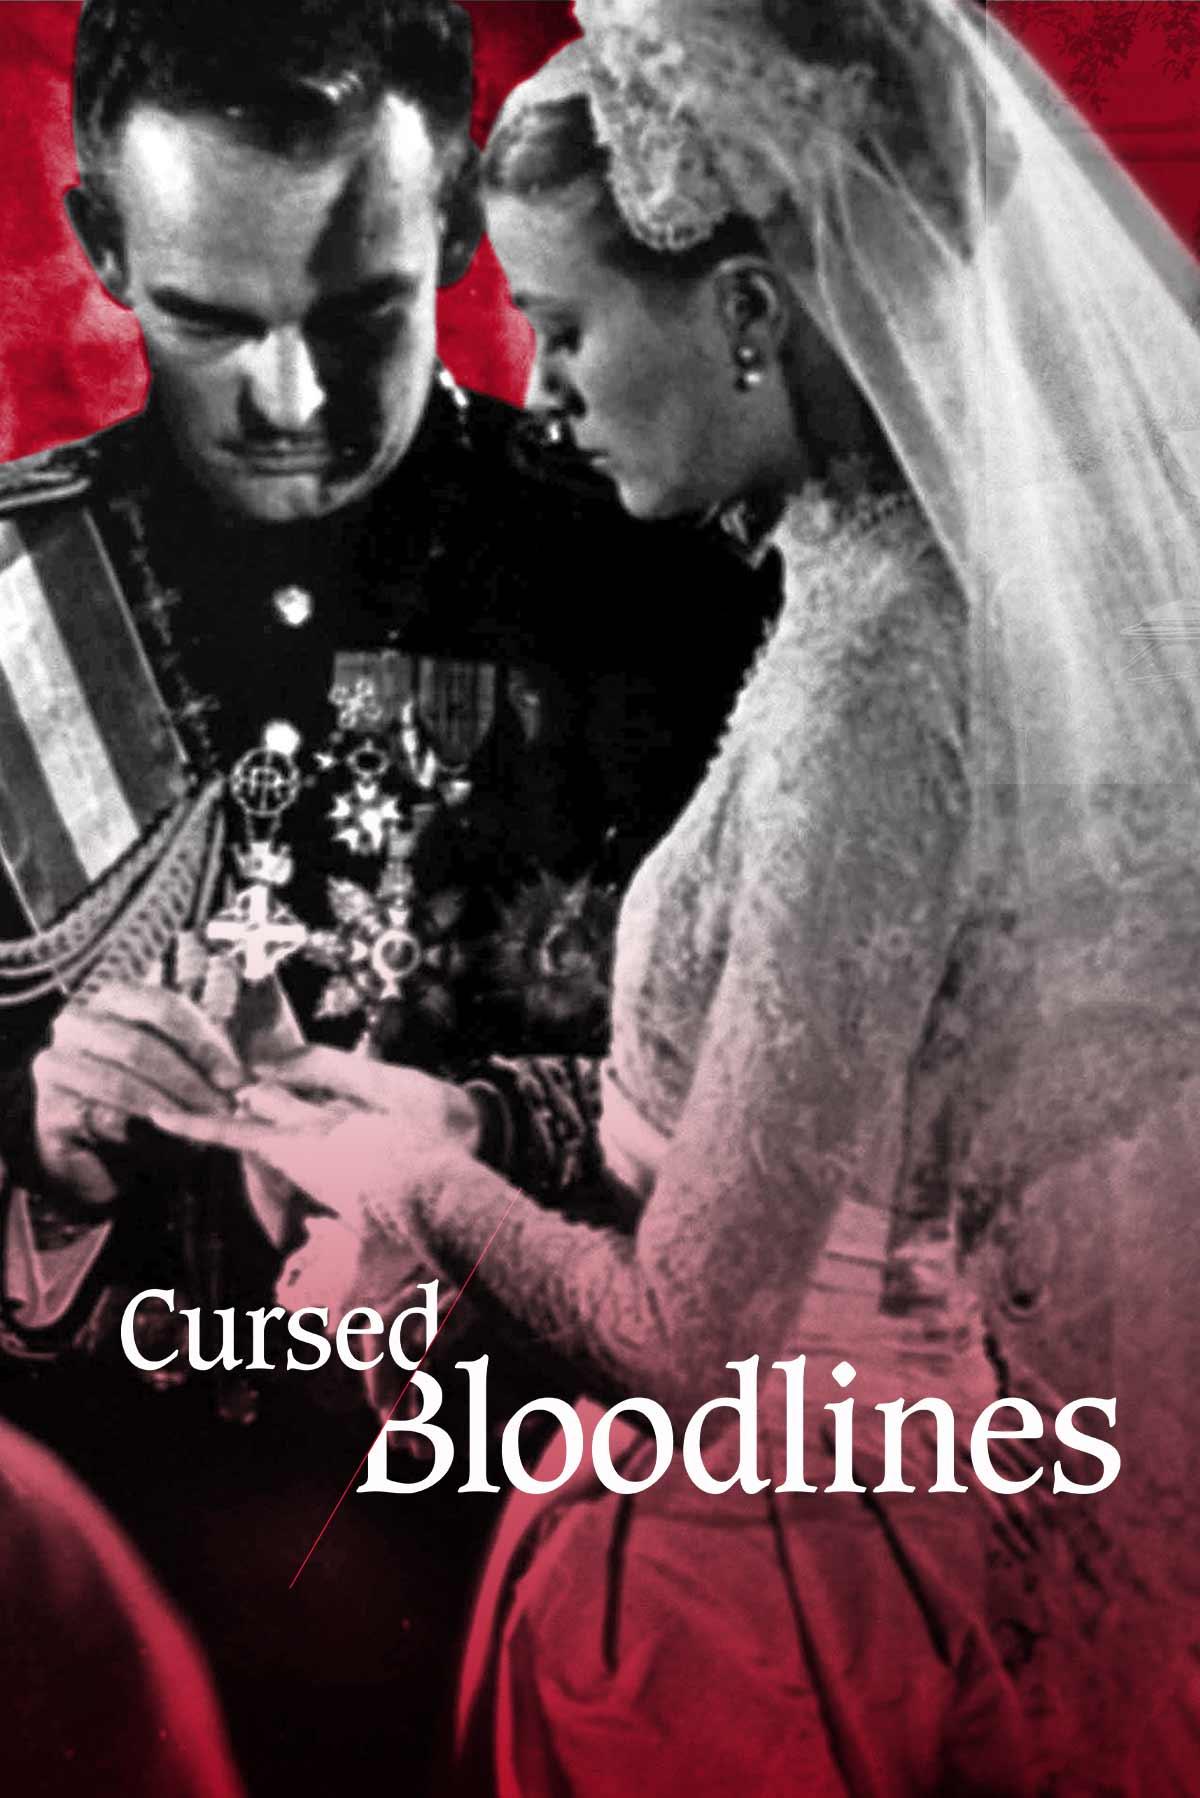 Cursed Bloodlines